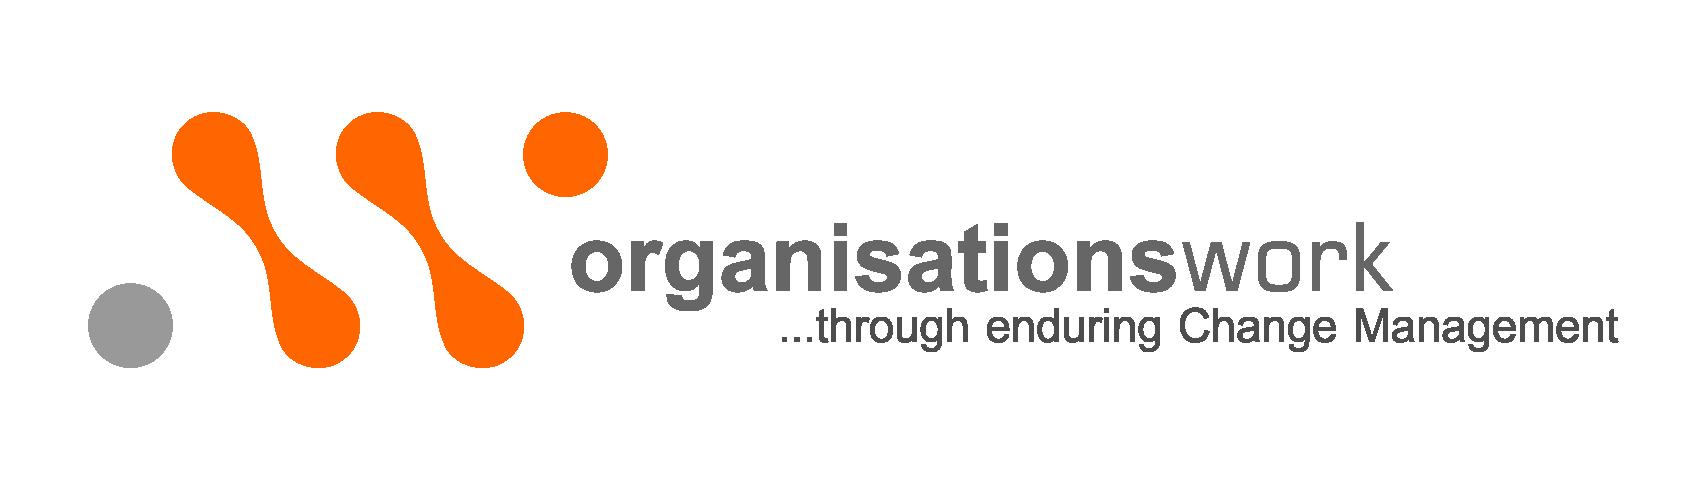 Orgs Work Logo Header Jan 16_1